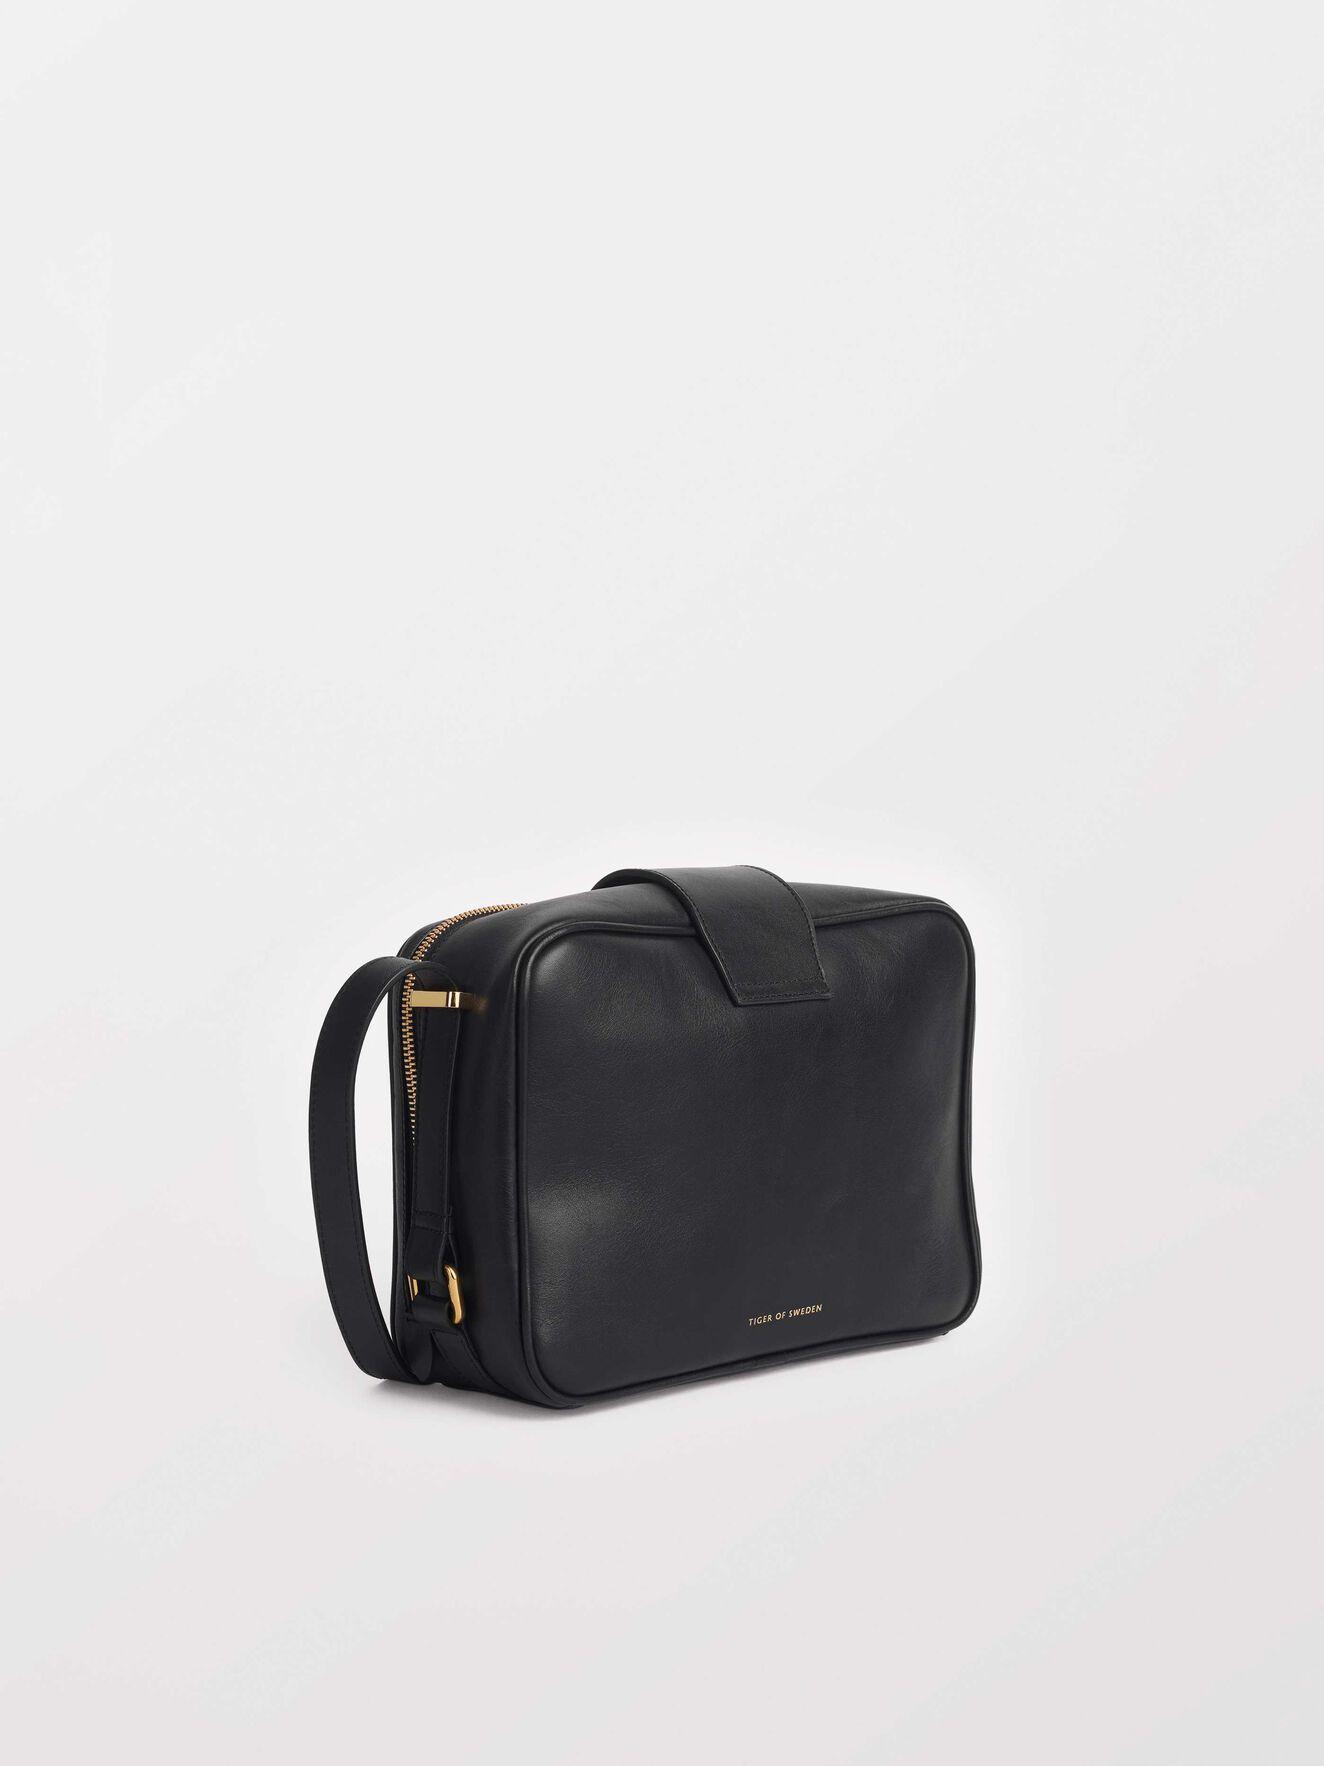 Balnina Bag in Black from Tiger of Sweden